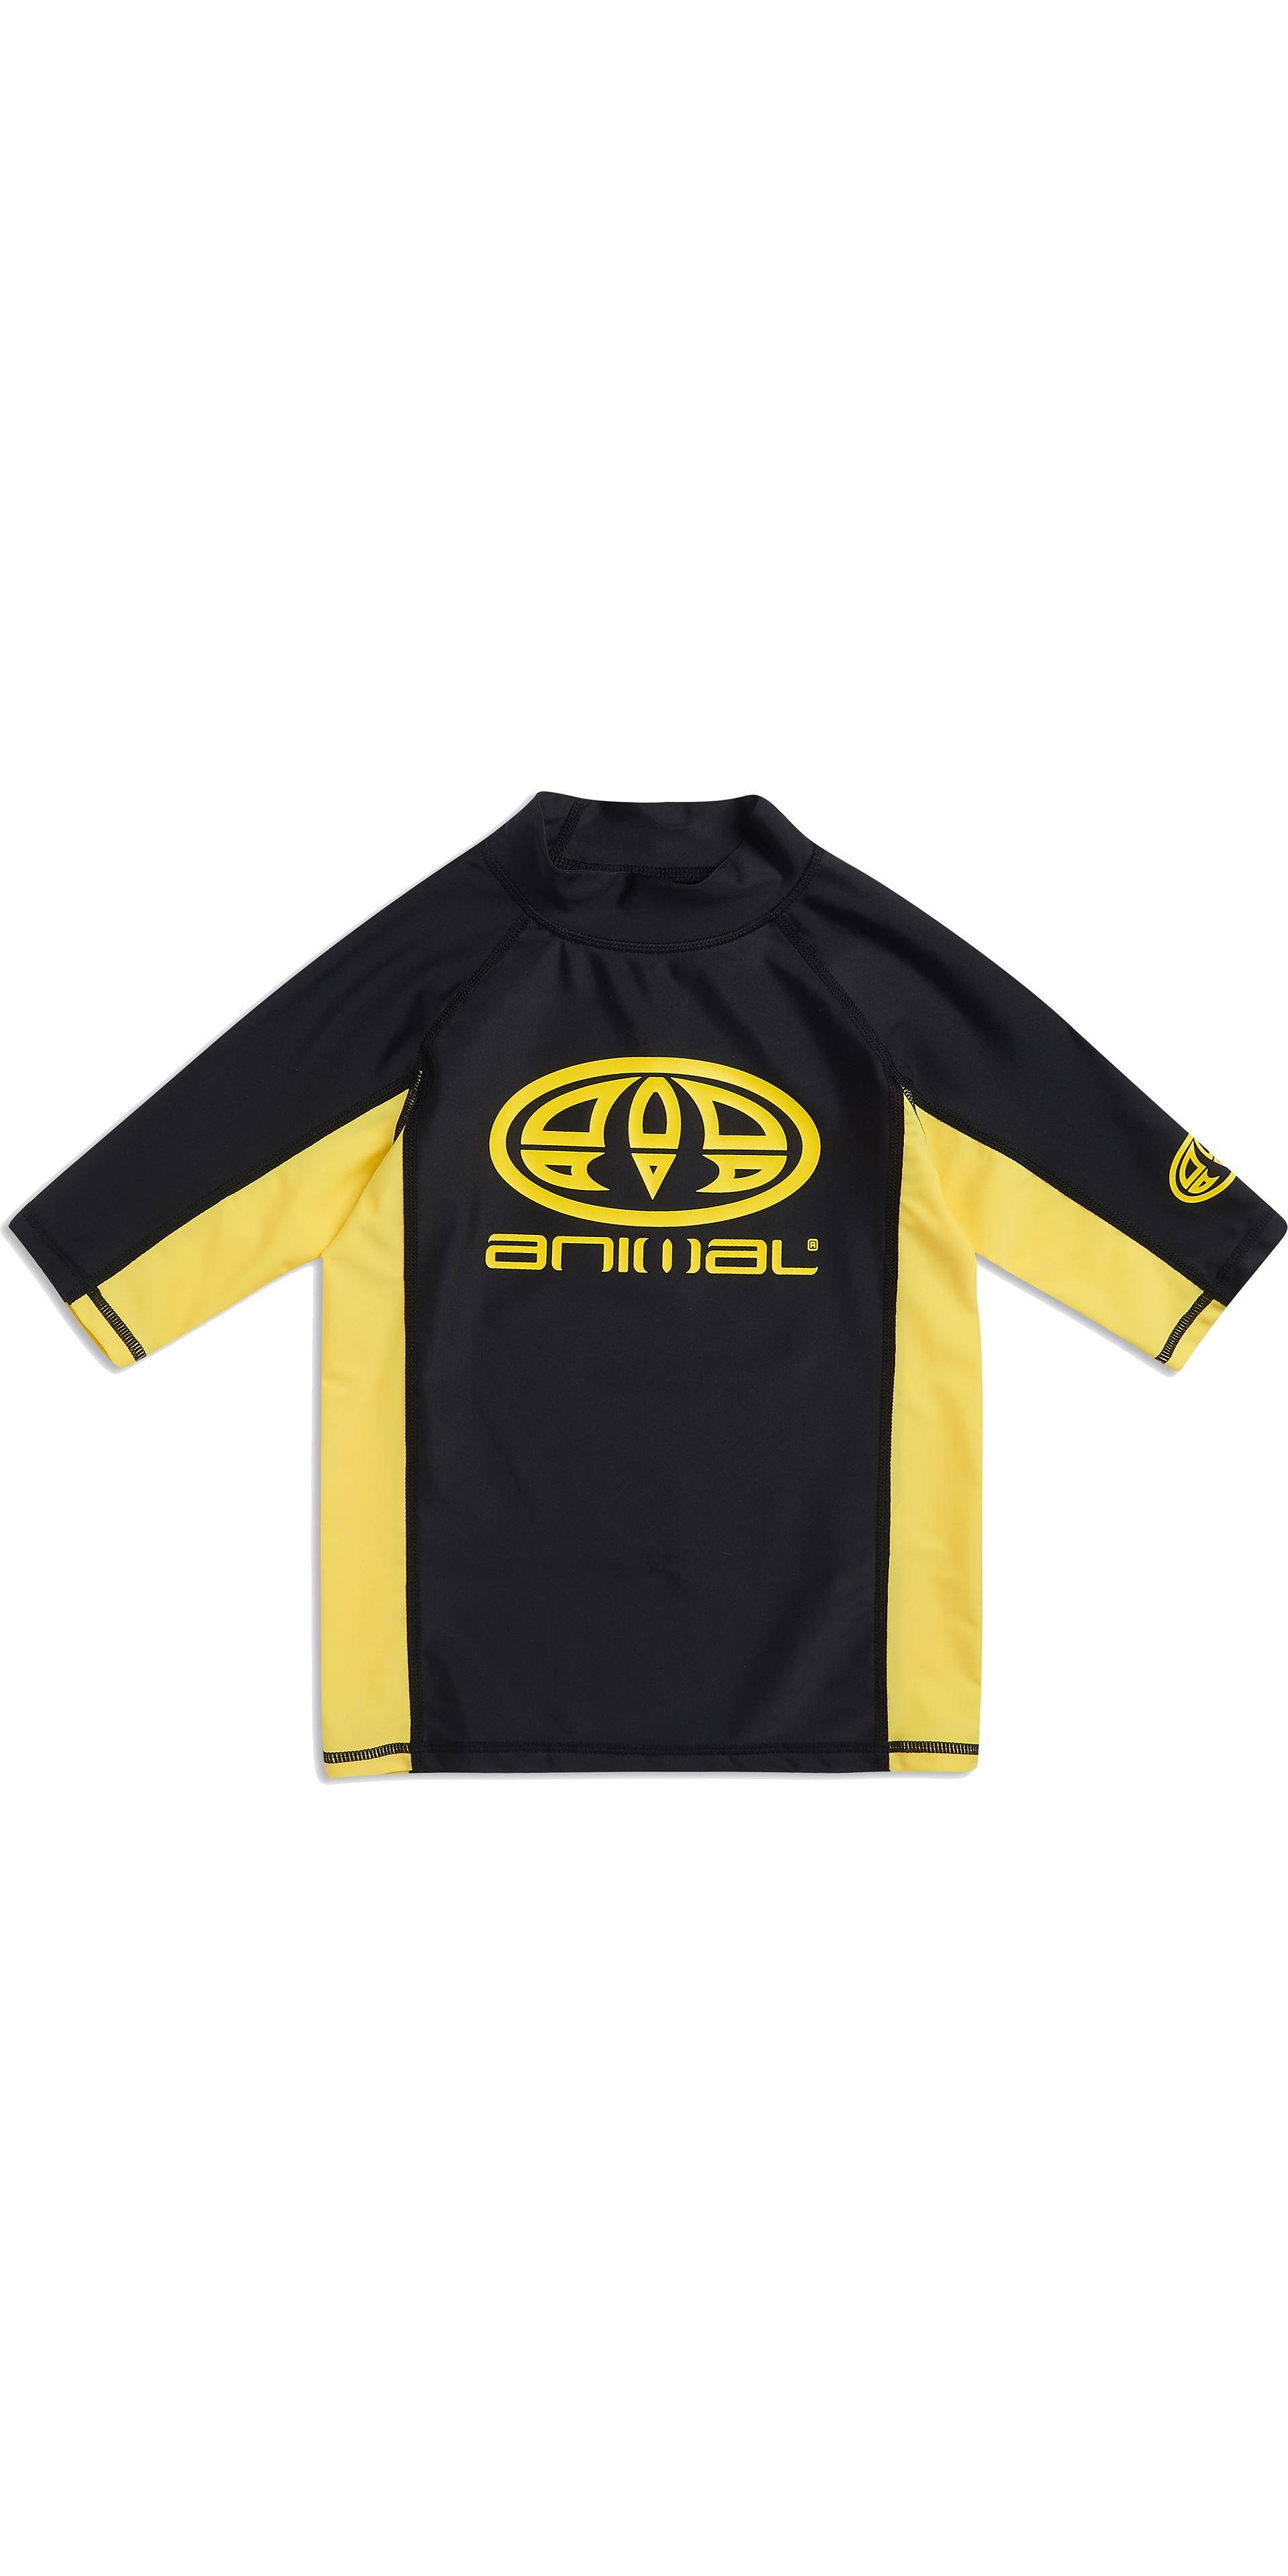 702b6a77a5 2019 Animal Junior Boys Hiltern Short Sleeve Rash Vest Black Cl9sq610 -  Short Sleeve Rash | Wetsuit Outlet